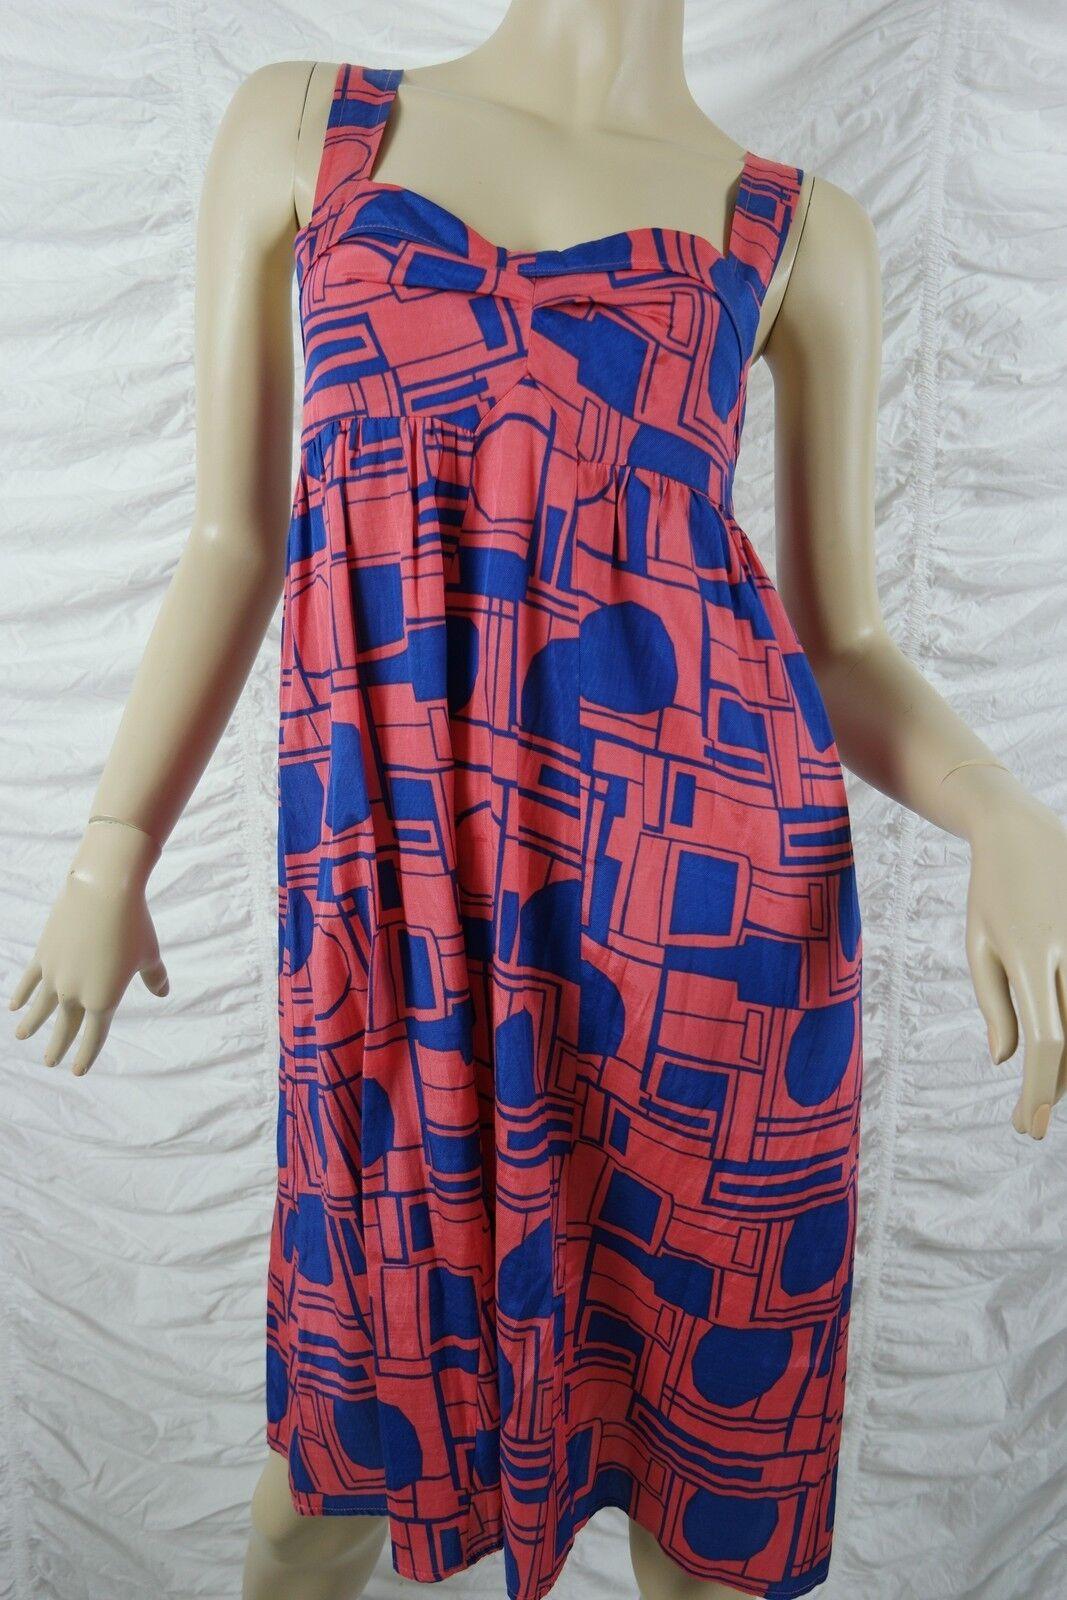 WISH rot melon Blau geometric print empire waist baby doll dress Größe 10 BNWT